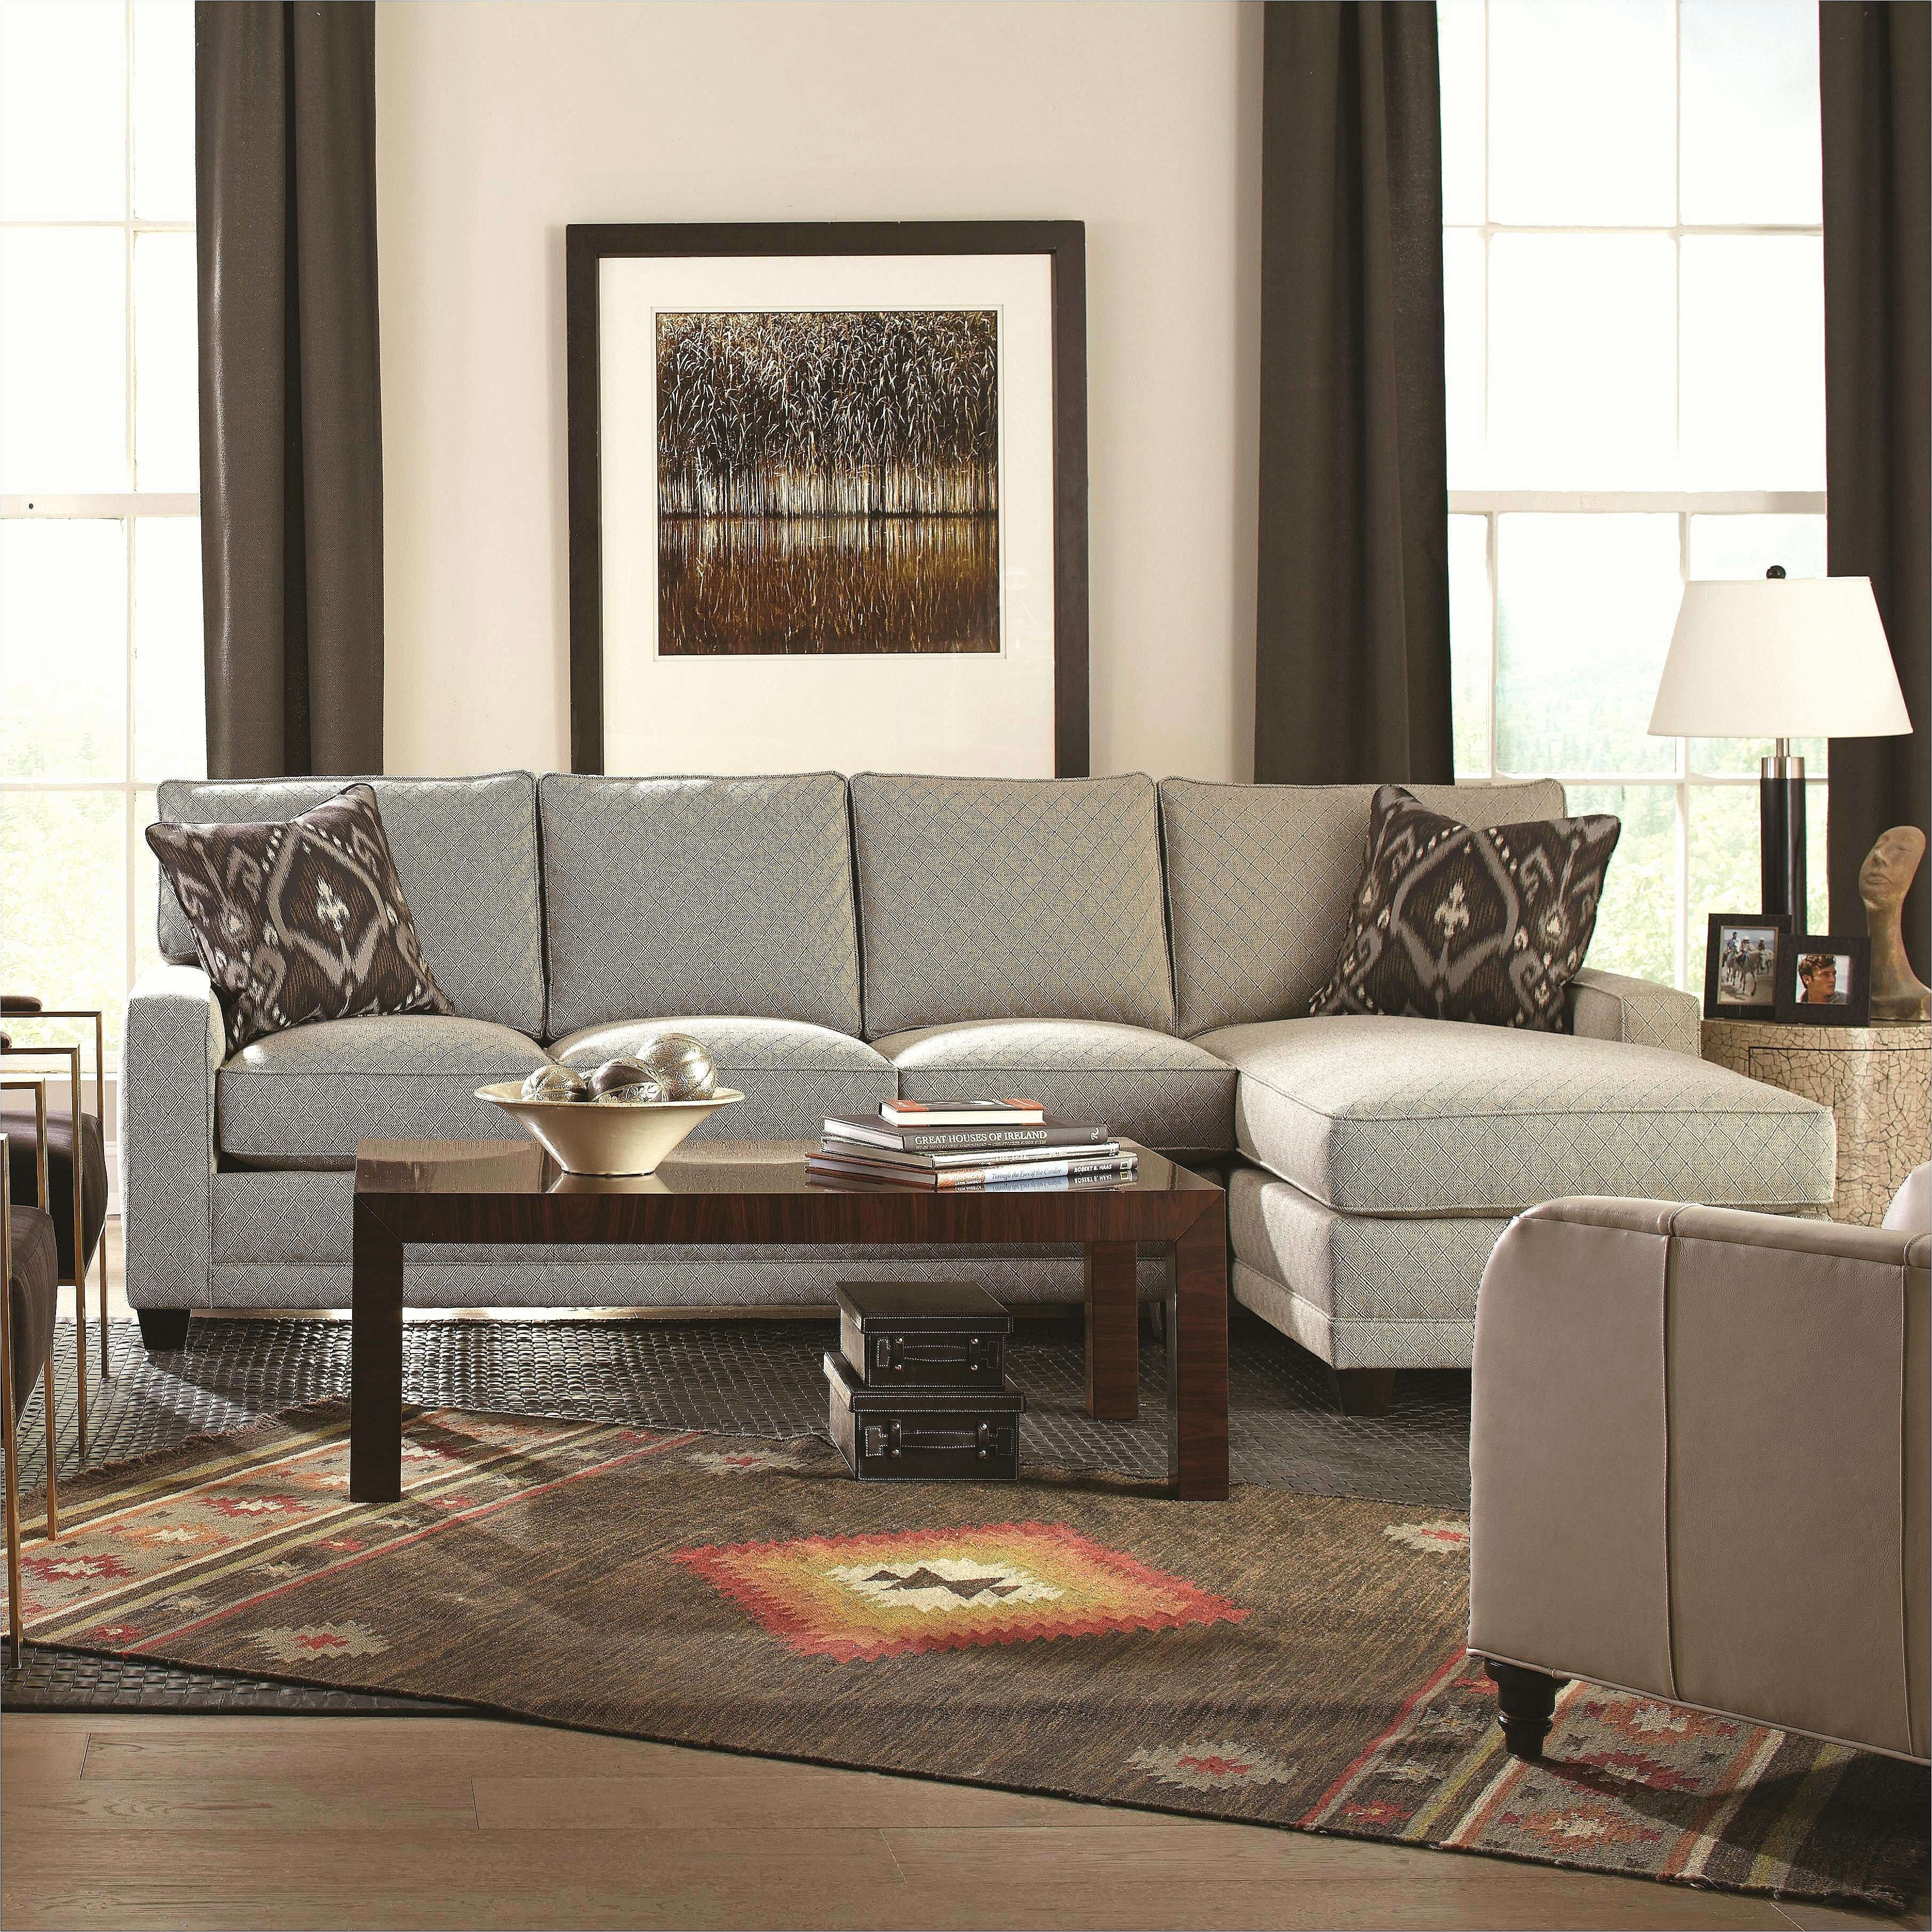 Outstanding Contemporary Living Room Tables Inspirationa Modern Living Room Furniture New Gunstige Sofa Macys Furniture 0d